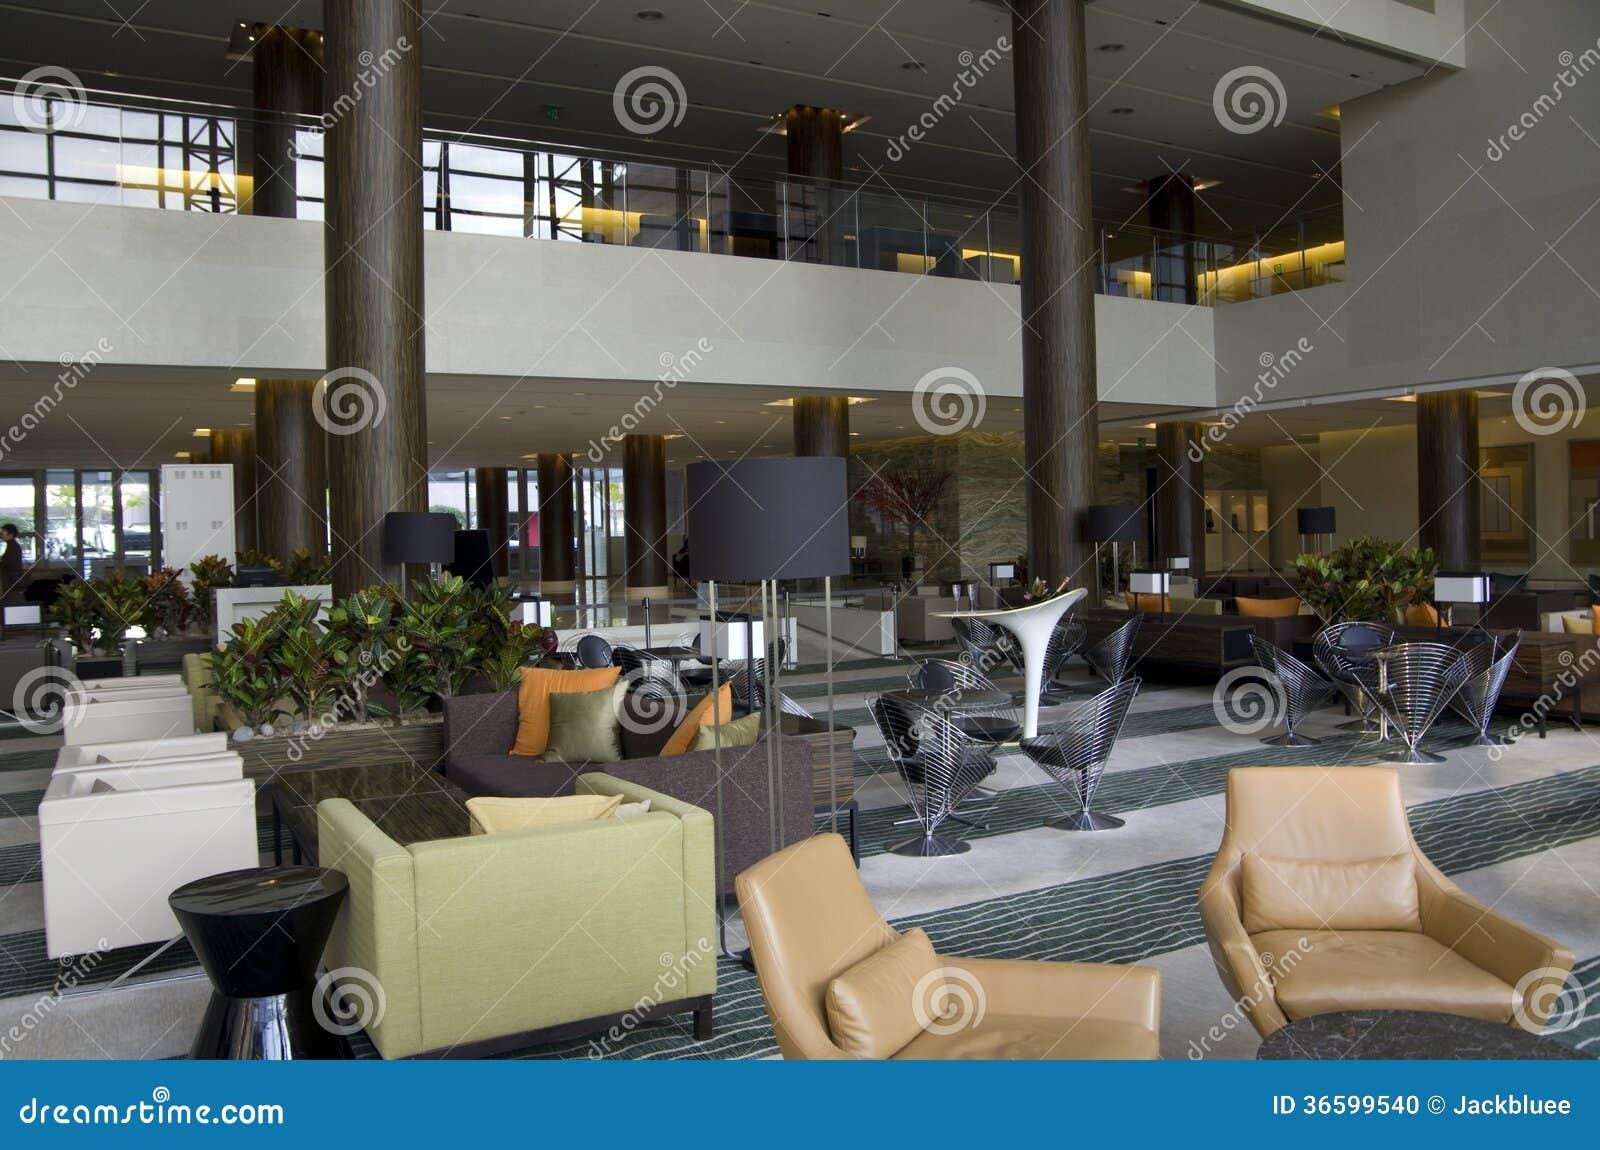 Upscale restaurant furniture - Hotel Lobby Lounge Bar Stock Photo Image 36599540